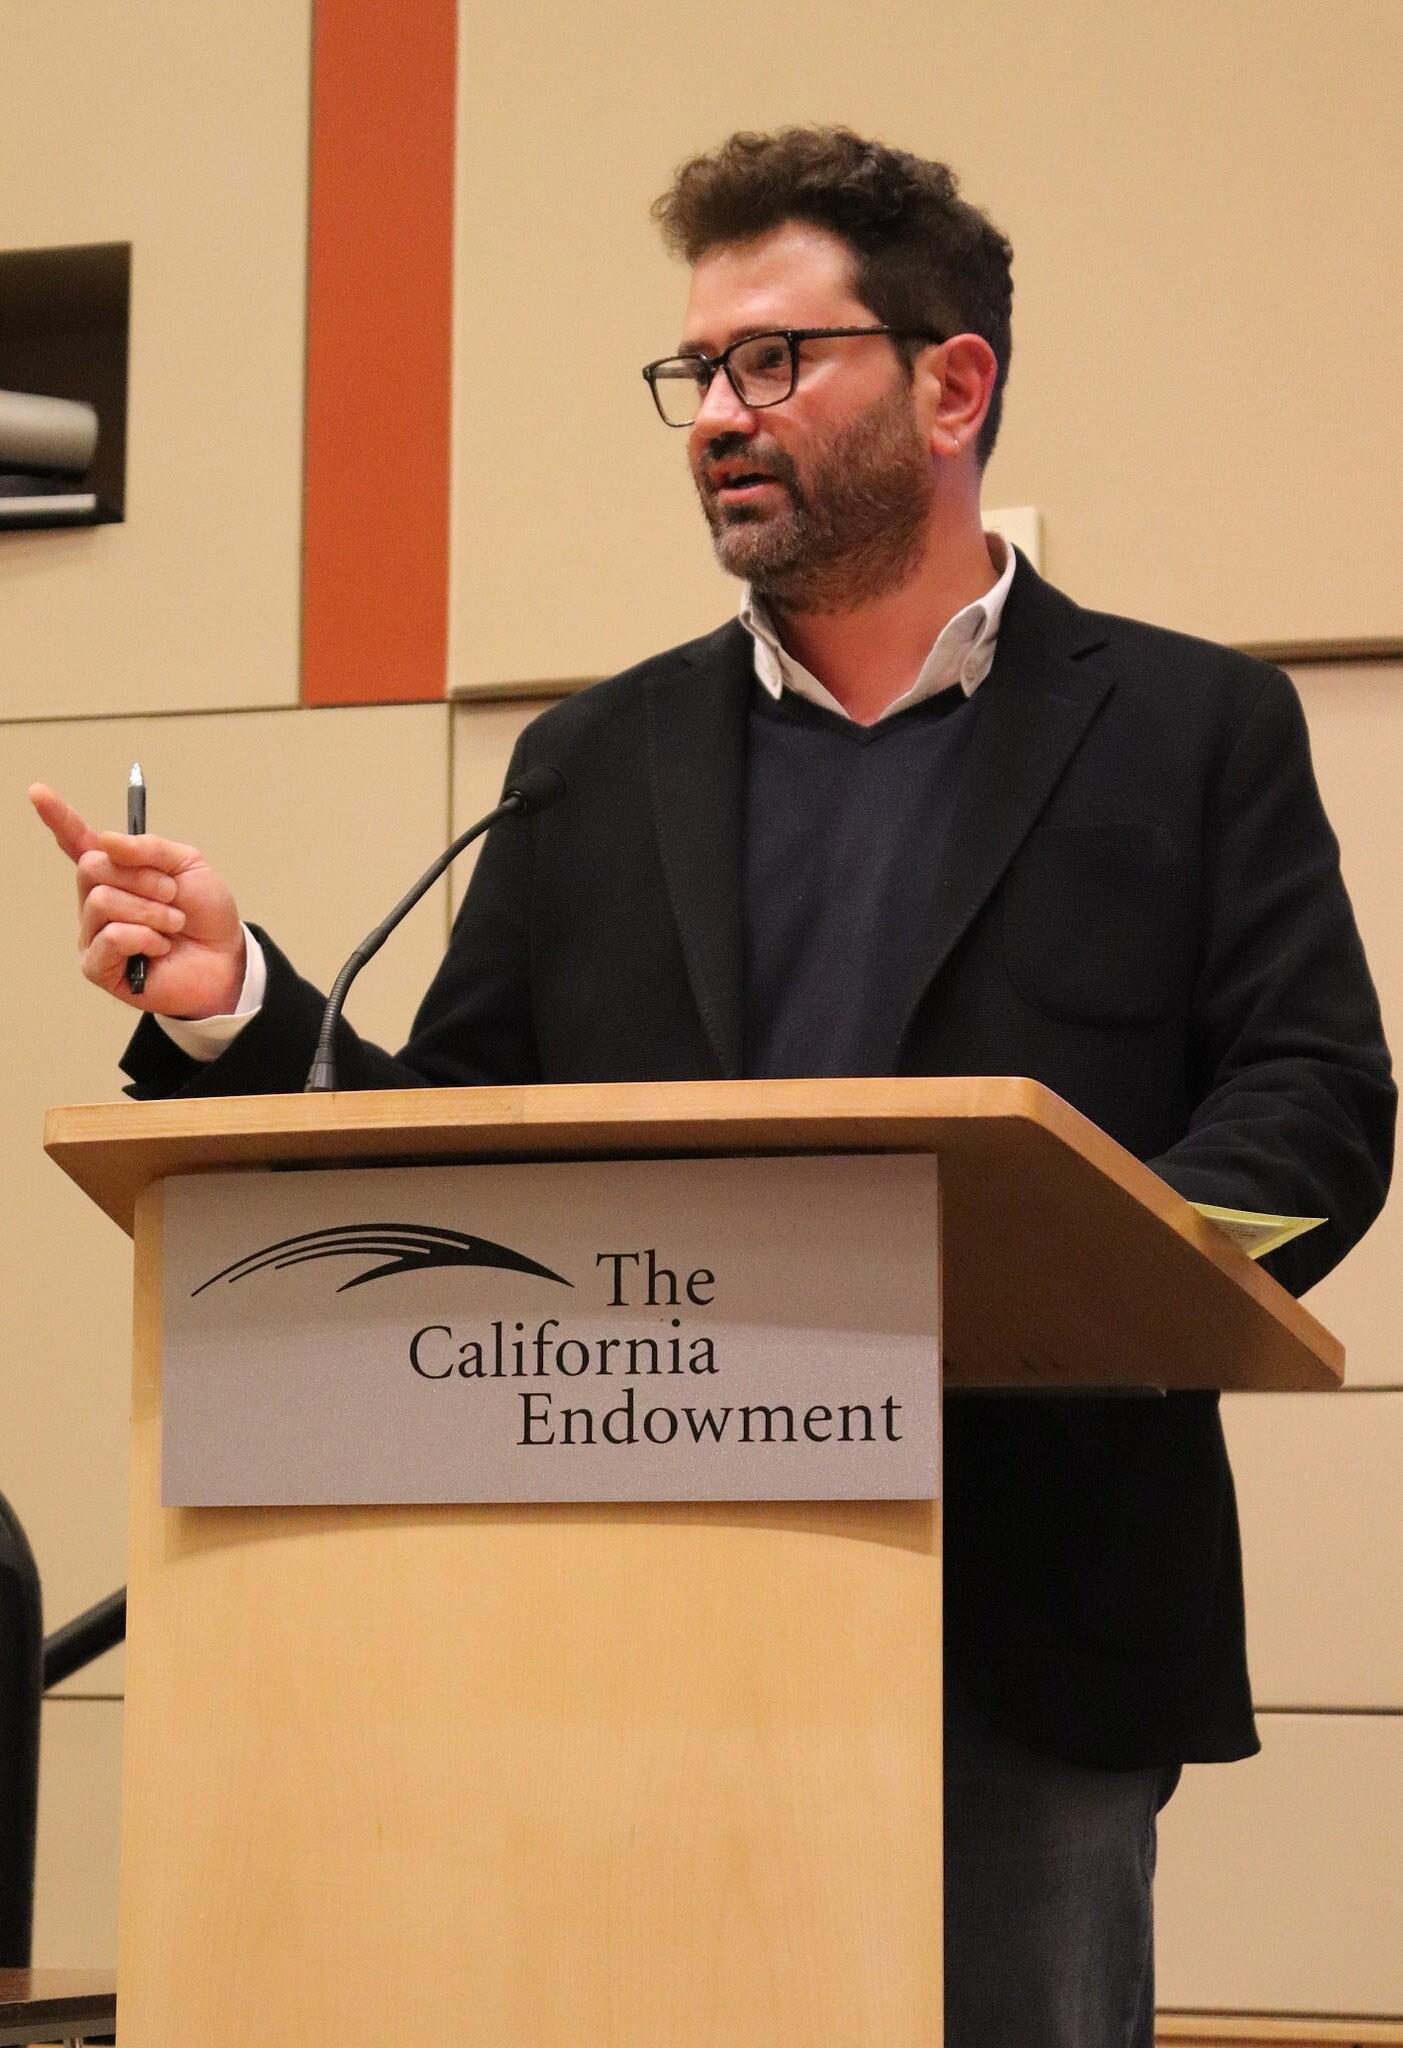 KCETLink Chief Creative Officer Juan Devis welcomes audience